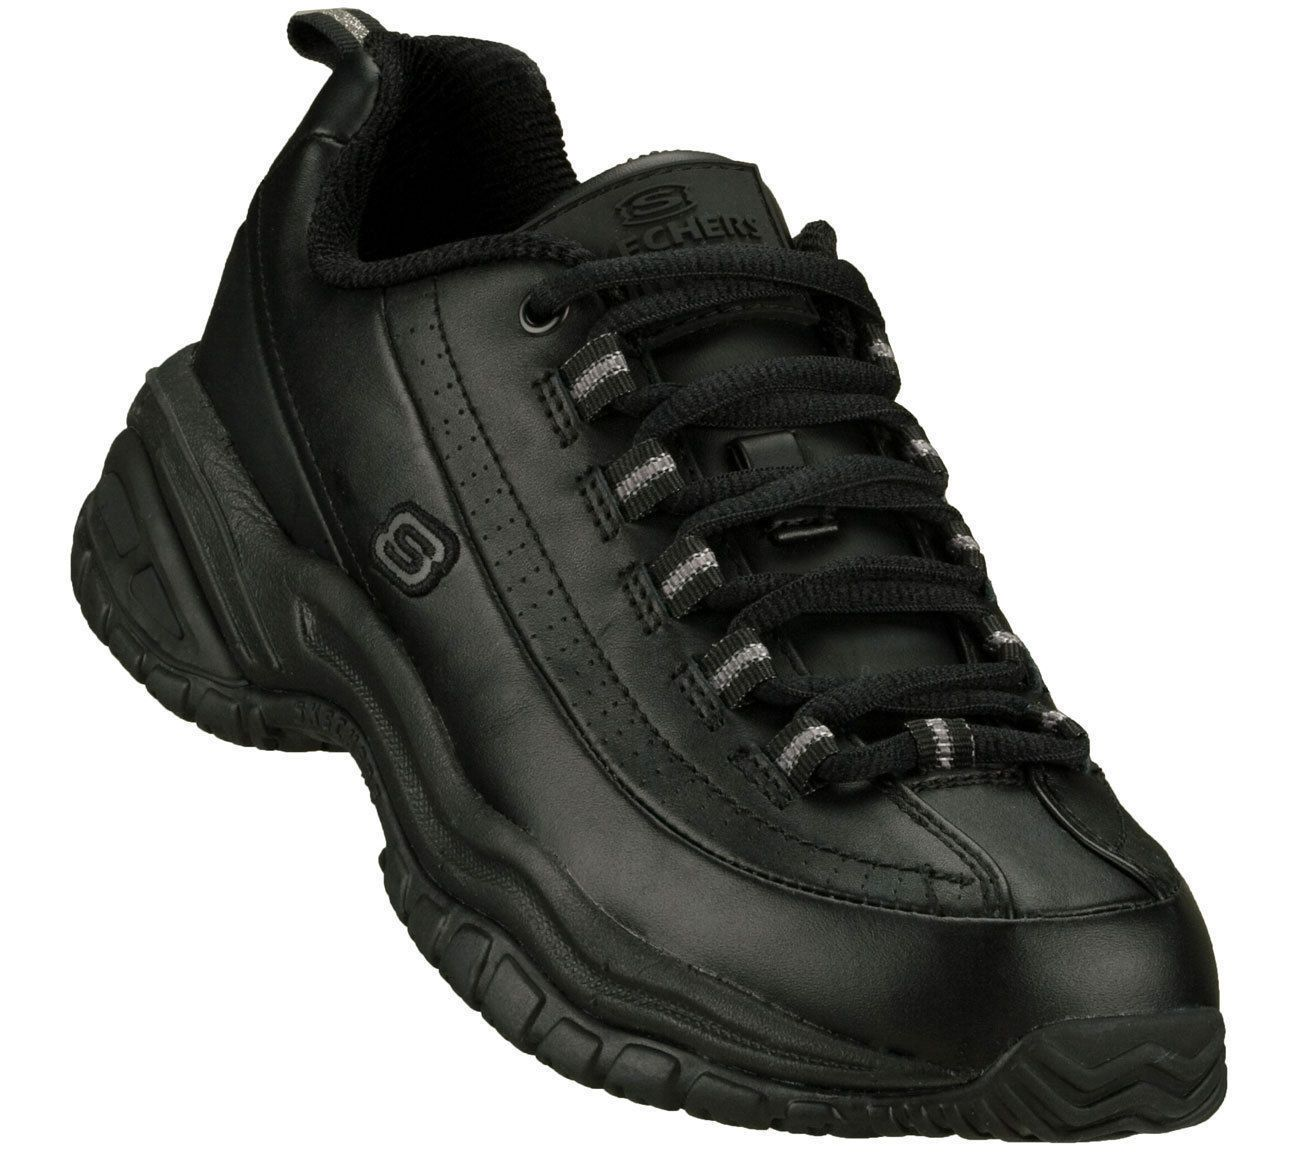 Skechers 76033 Womens Work Shoes Soft Stride Softie Slip Resistant